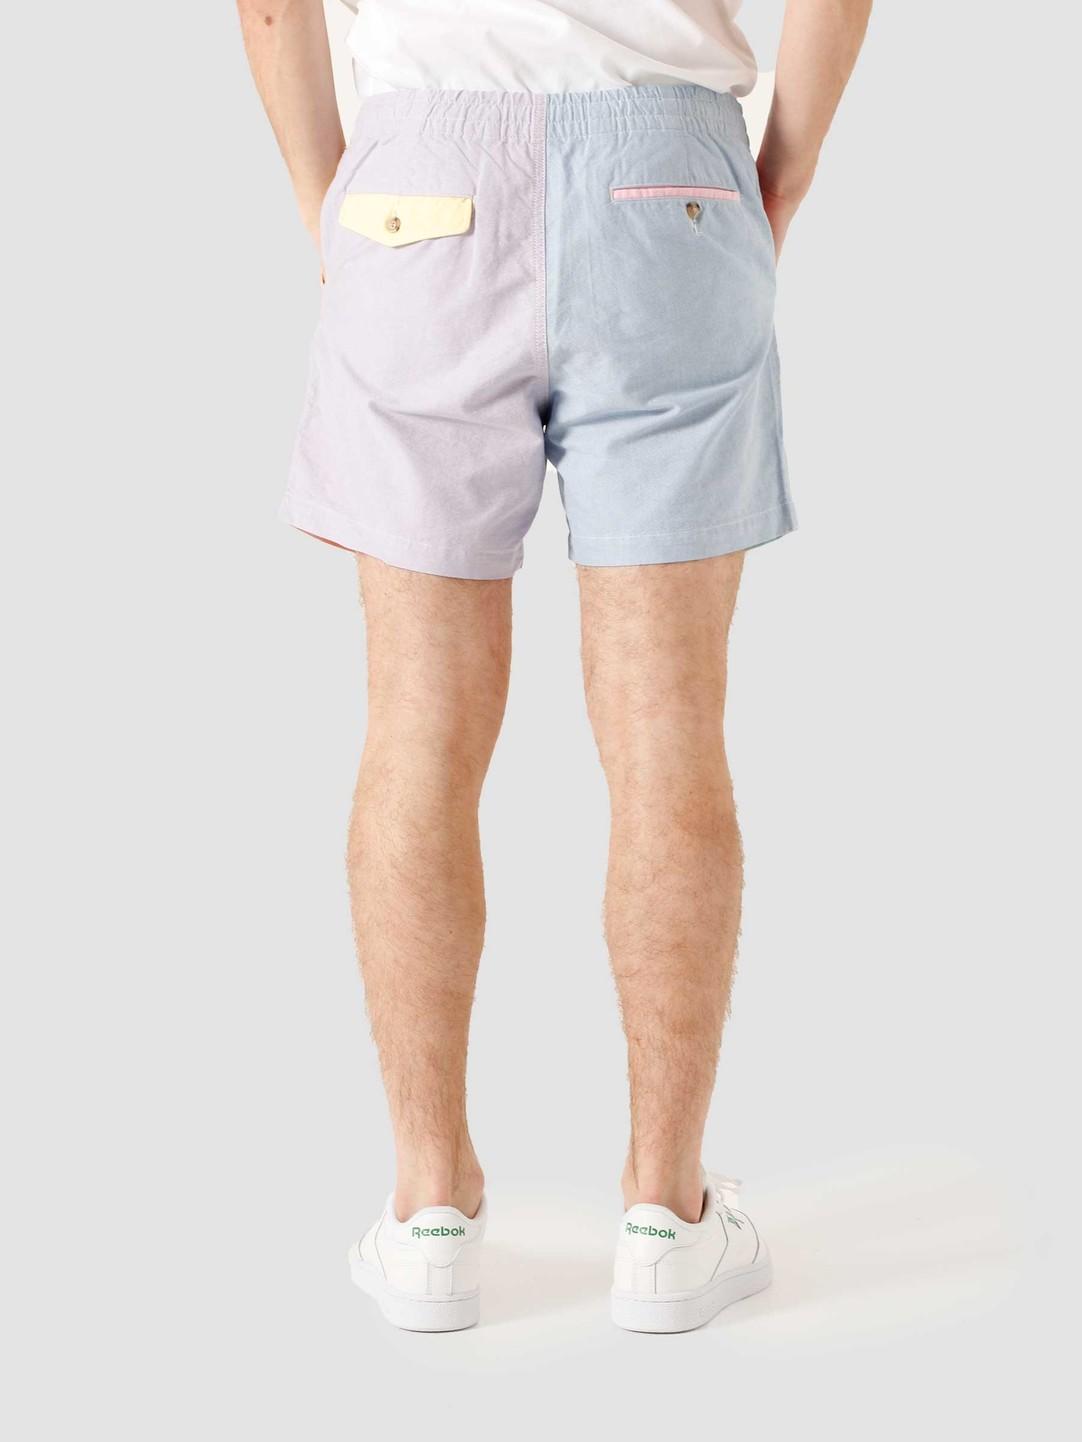 Polo Ralph Lauren Polo Ralph Lauren Classic Fit Prepster Short Multi 710836474001